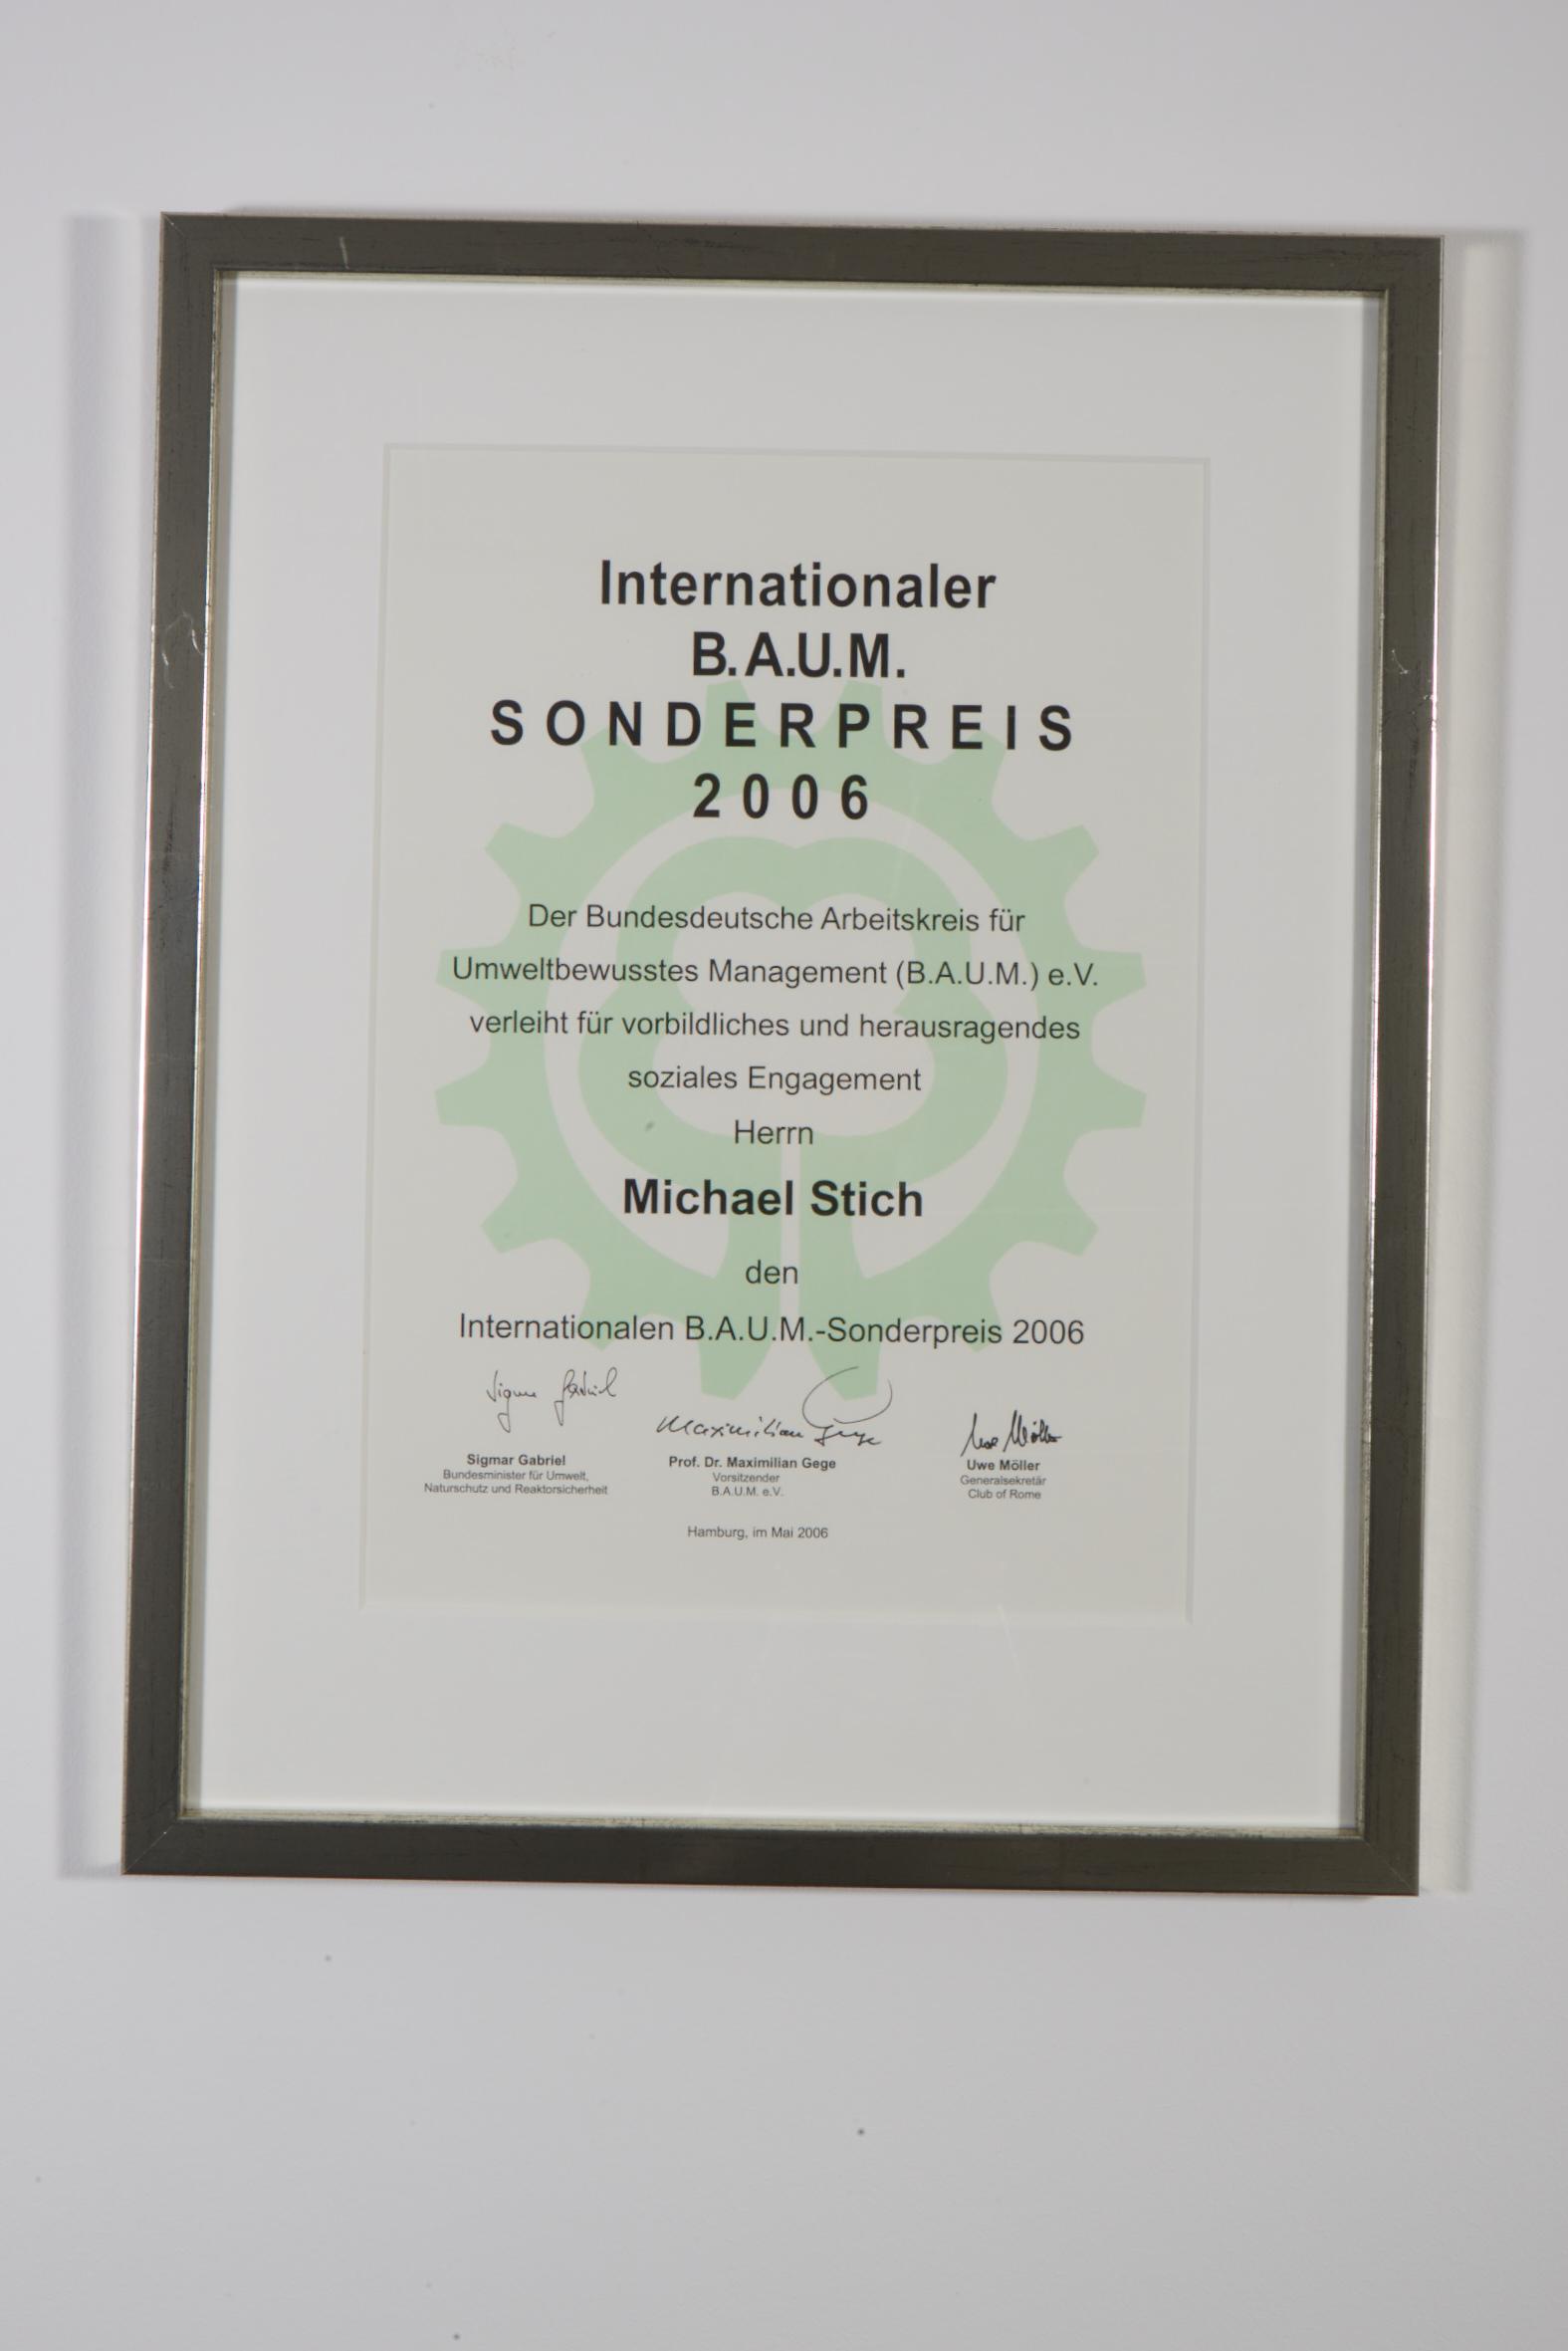 Internationaler B.A.U.M. Sonderpreis, 2006